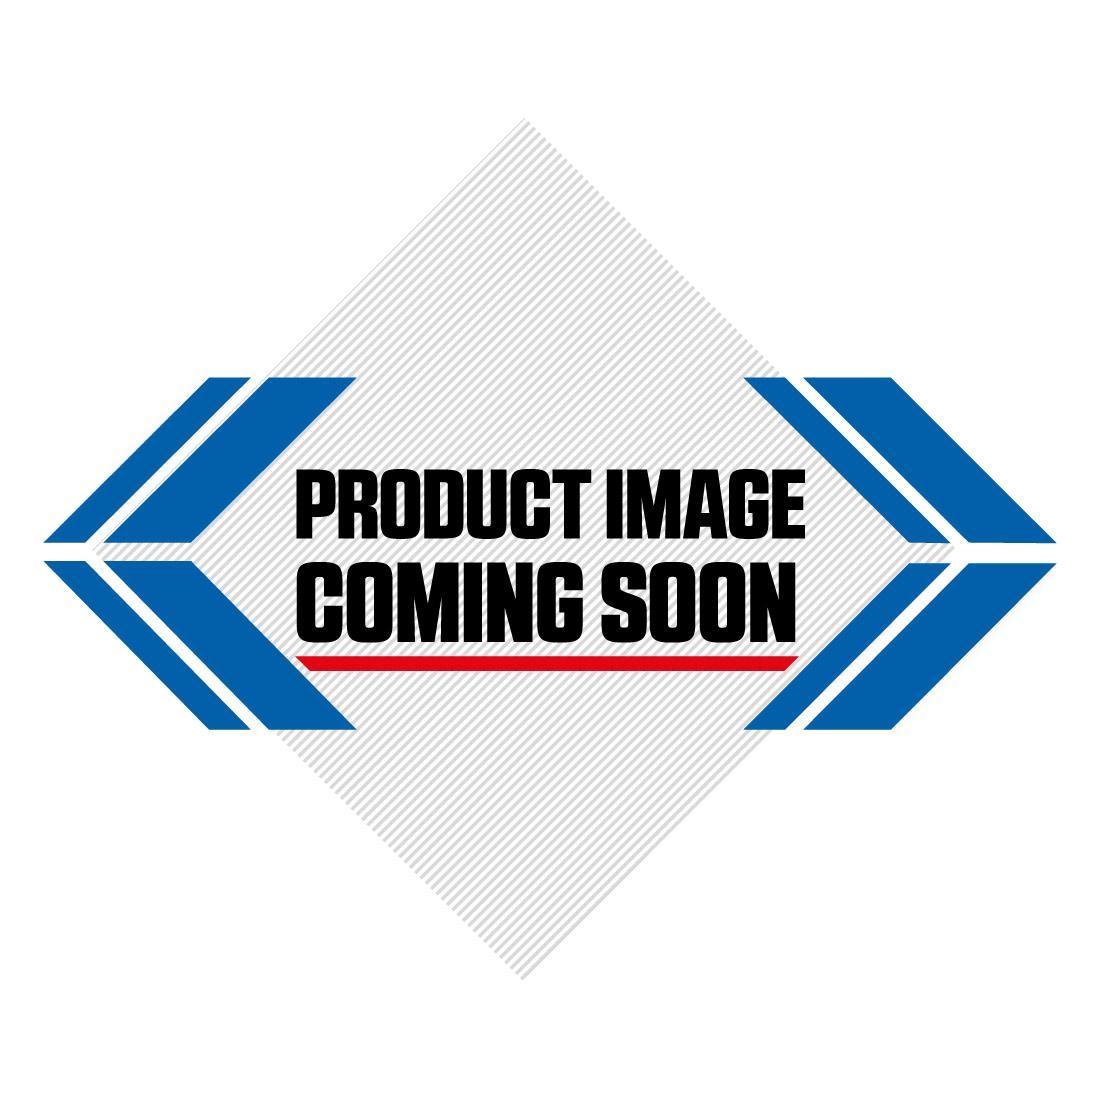 DJI Mavic Pro Platinum Drone Image-4